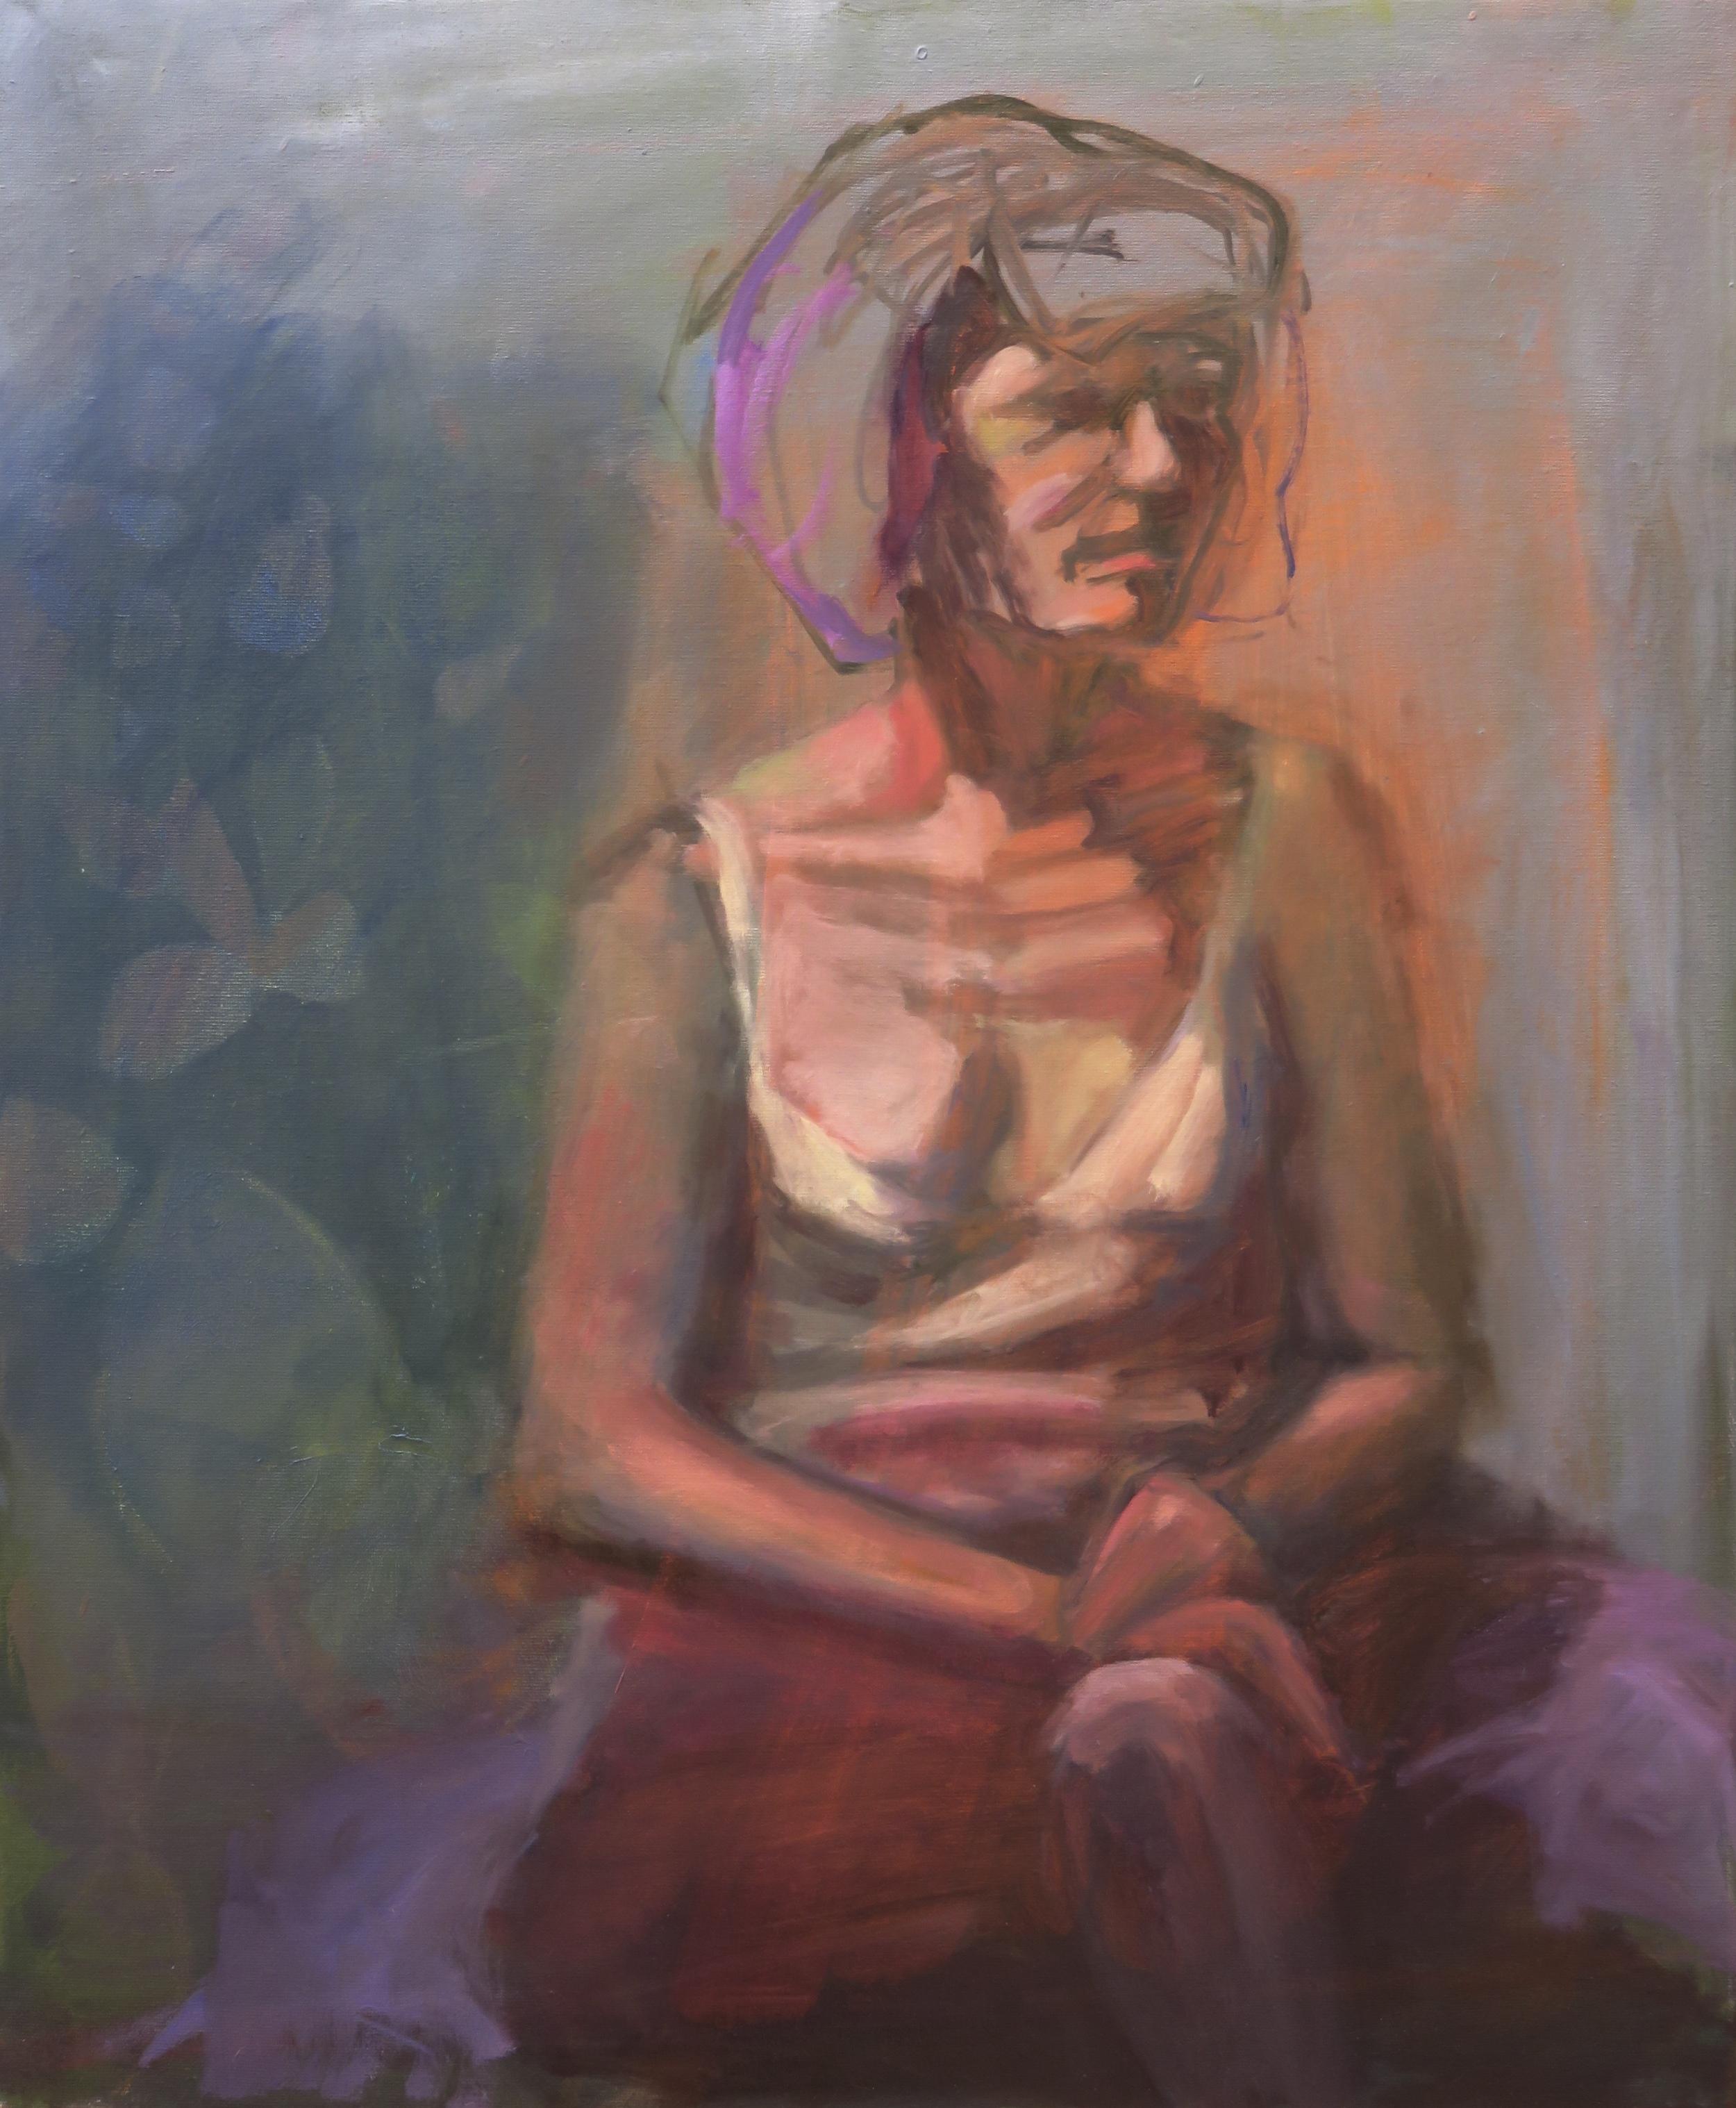 "Glowing in fuchsia, 24"" x 20"" oil on canvas"